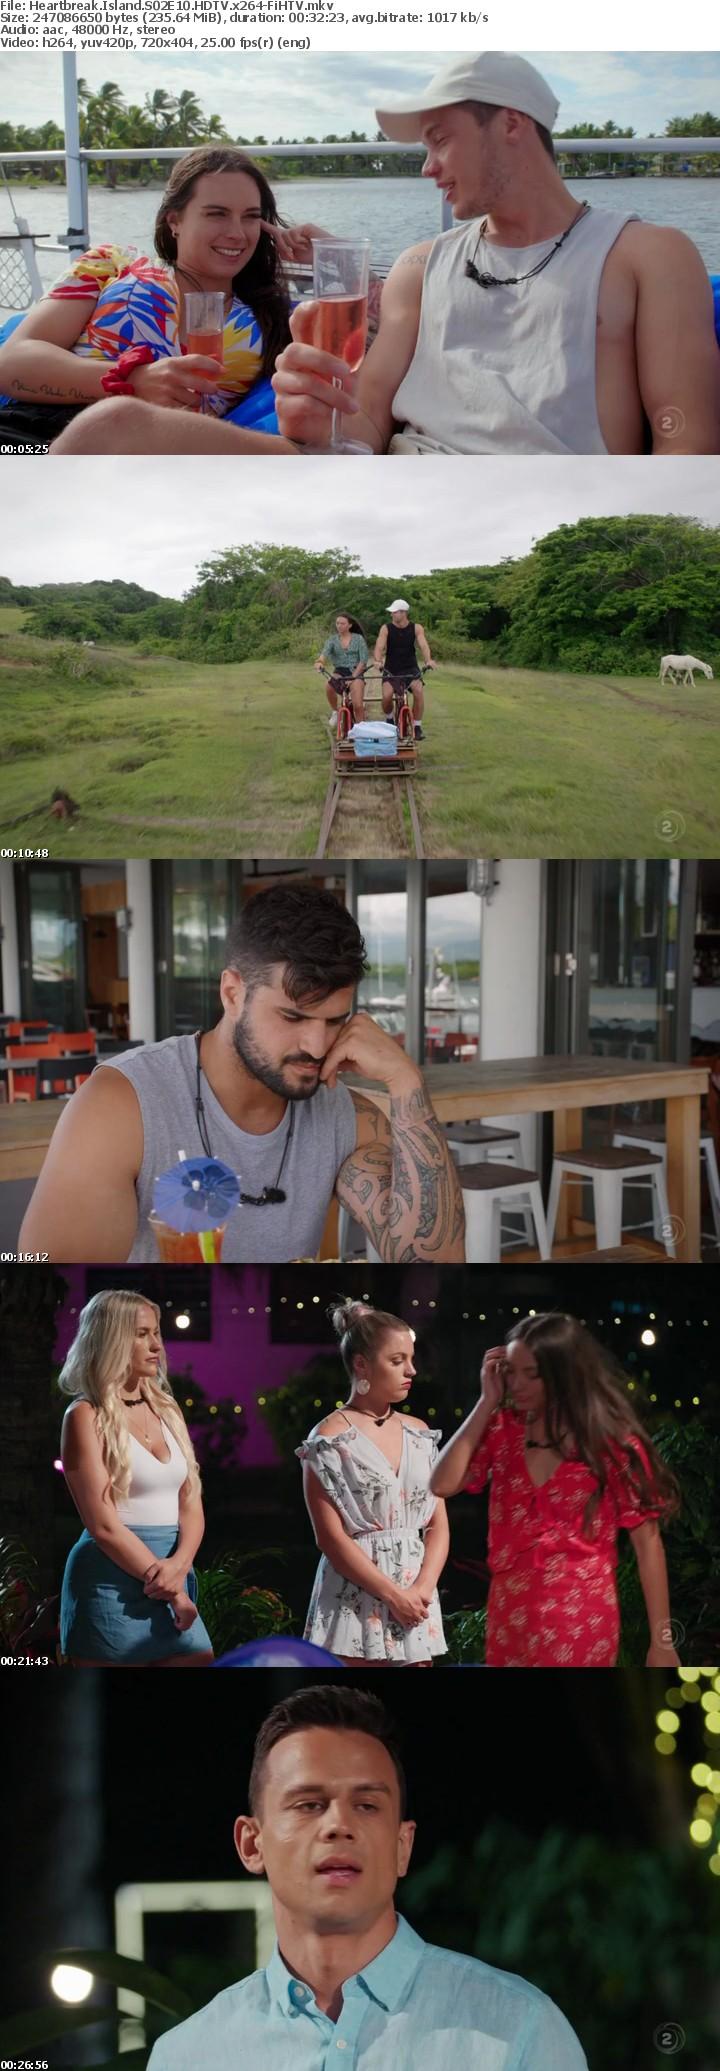 Heartbreak Island S02E10 HDTV x264-FiHTV